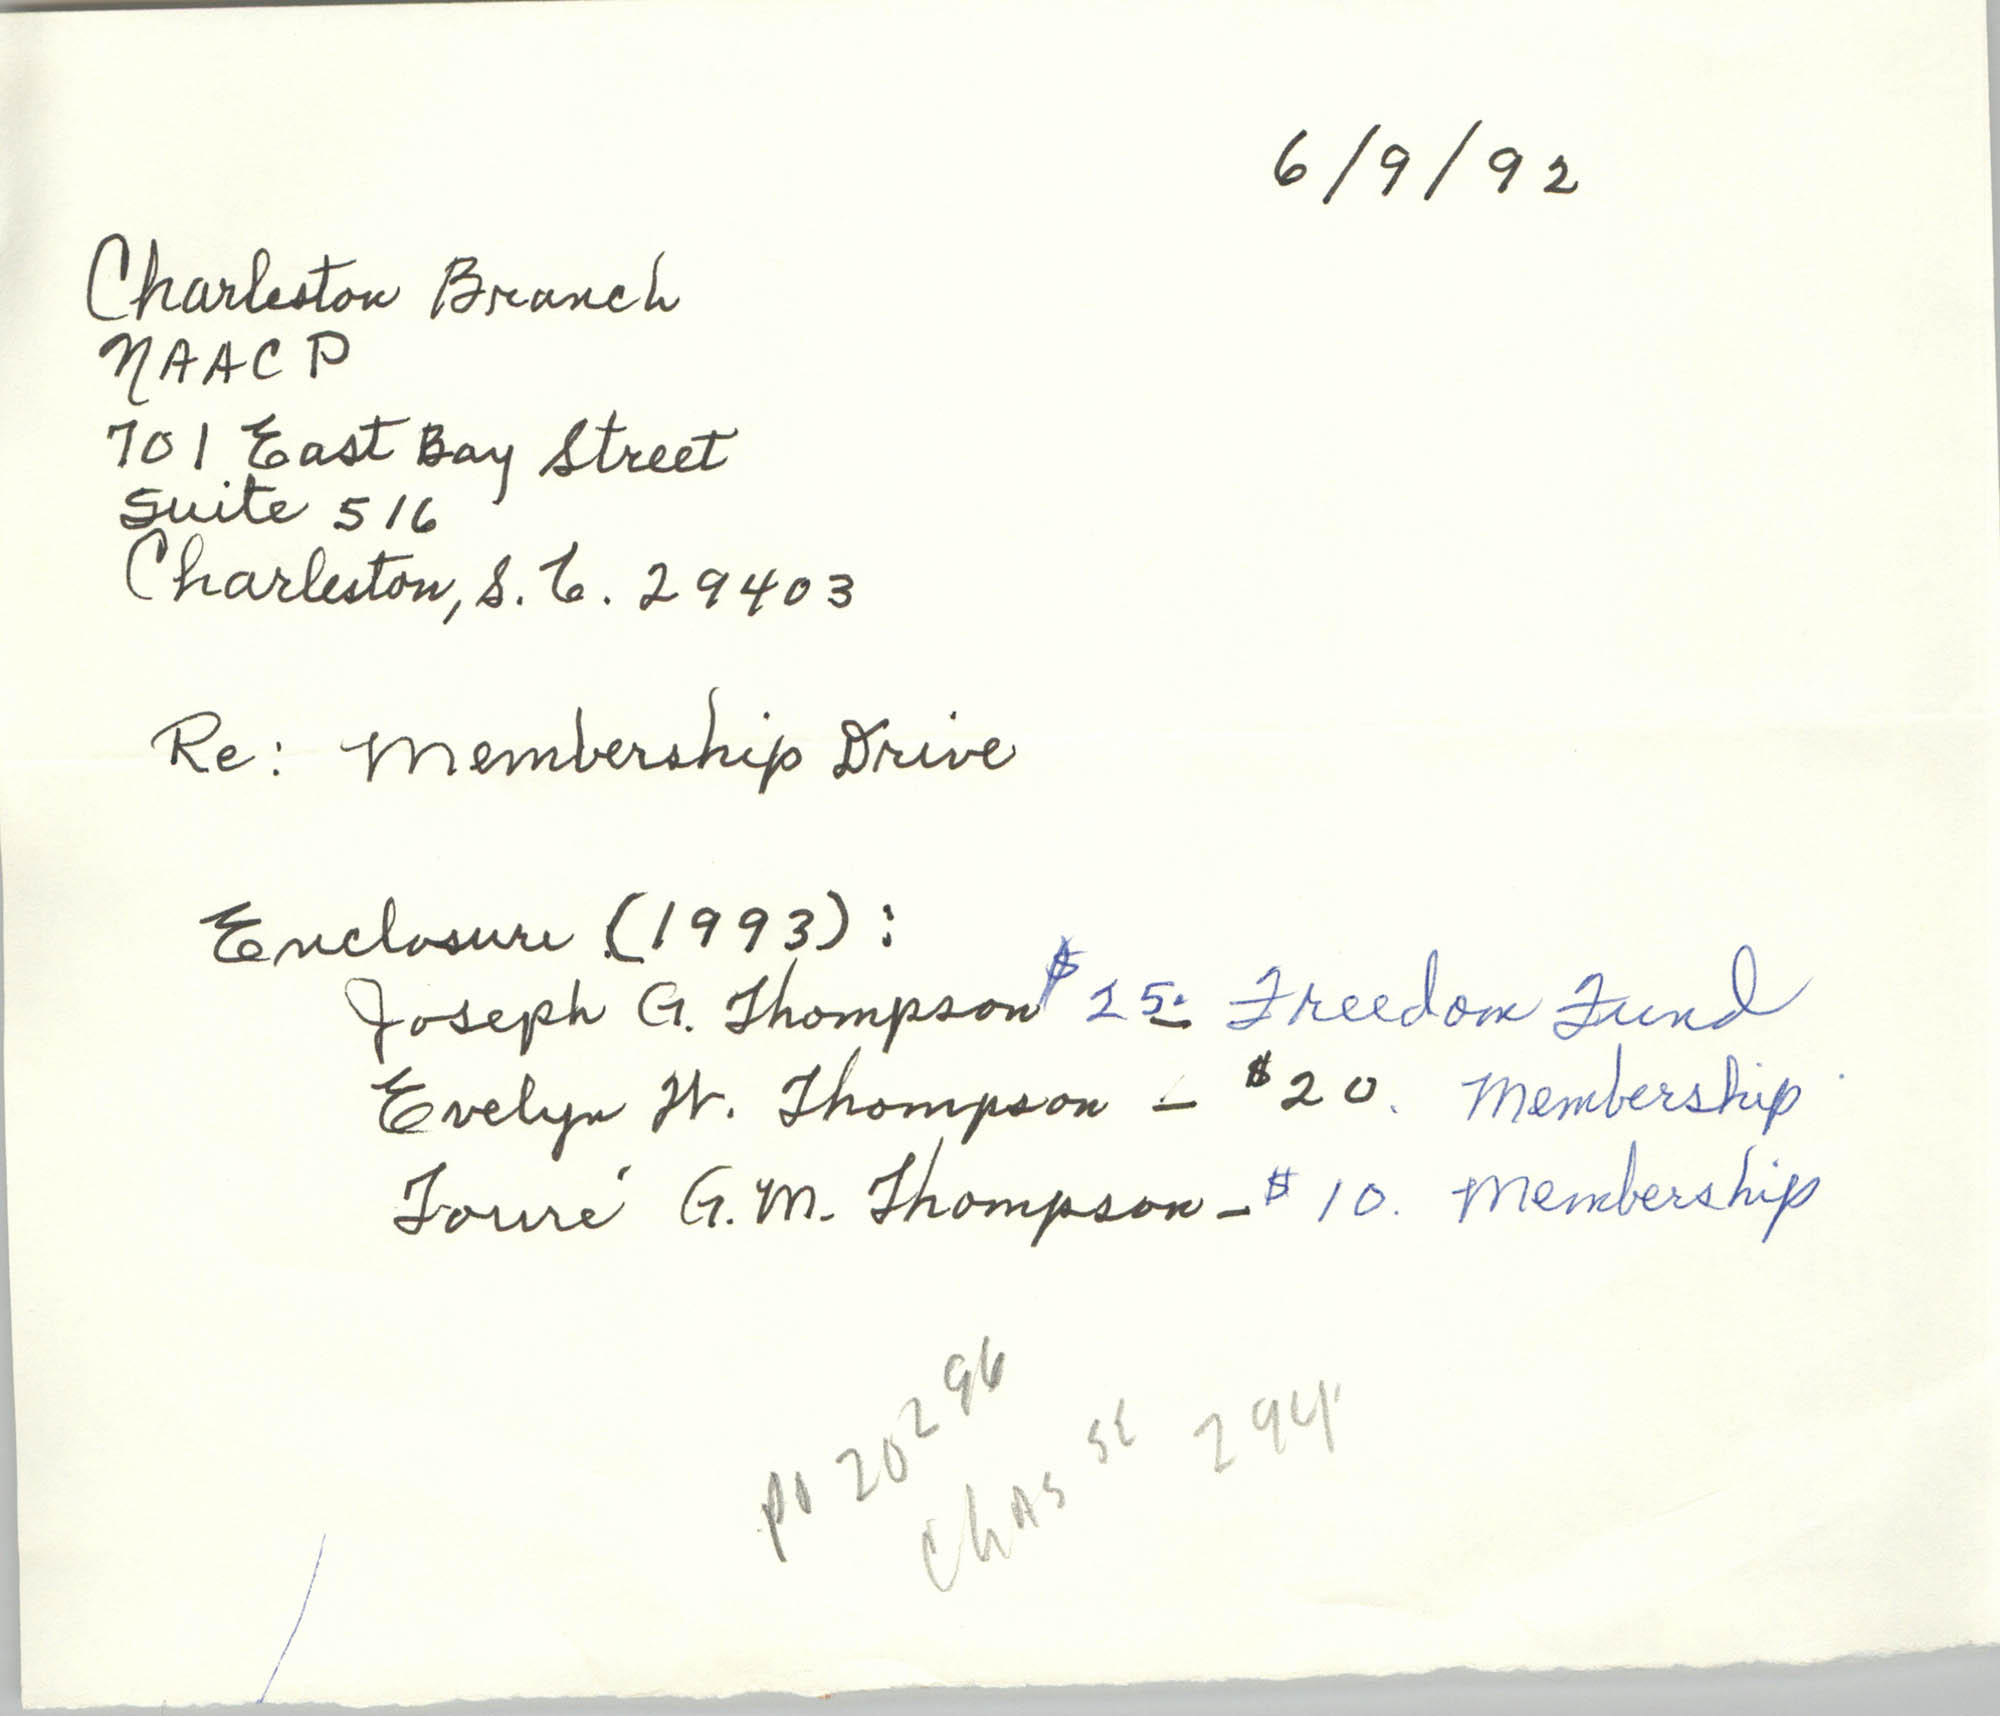 Note, Membership Drive, June 9, 1992